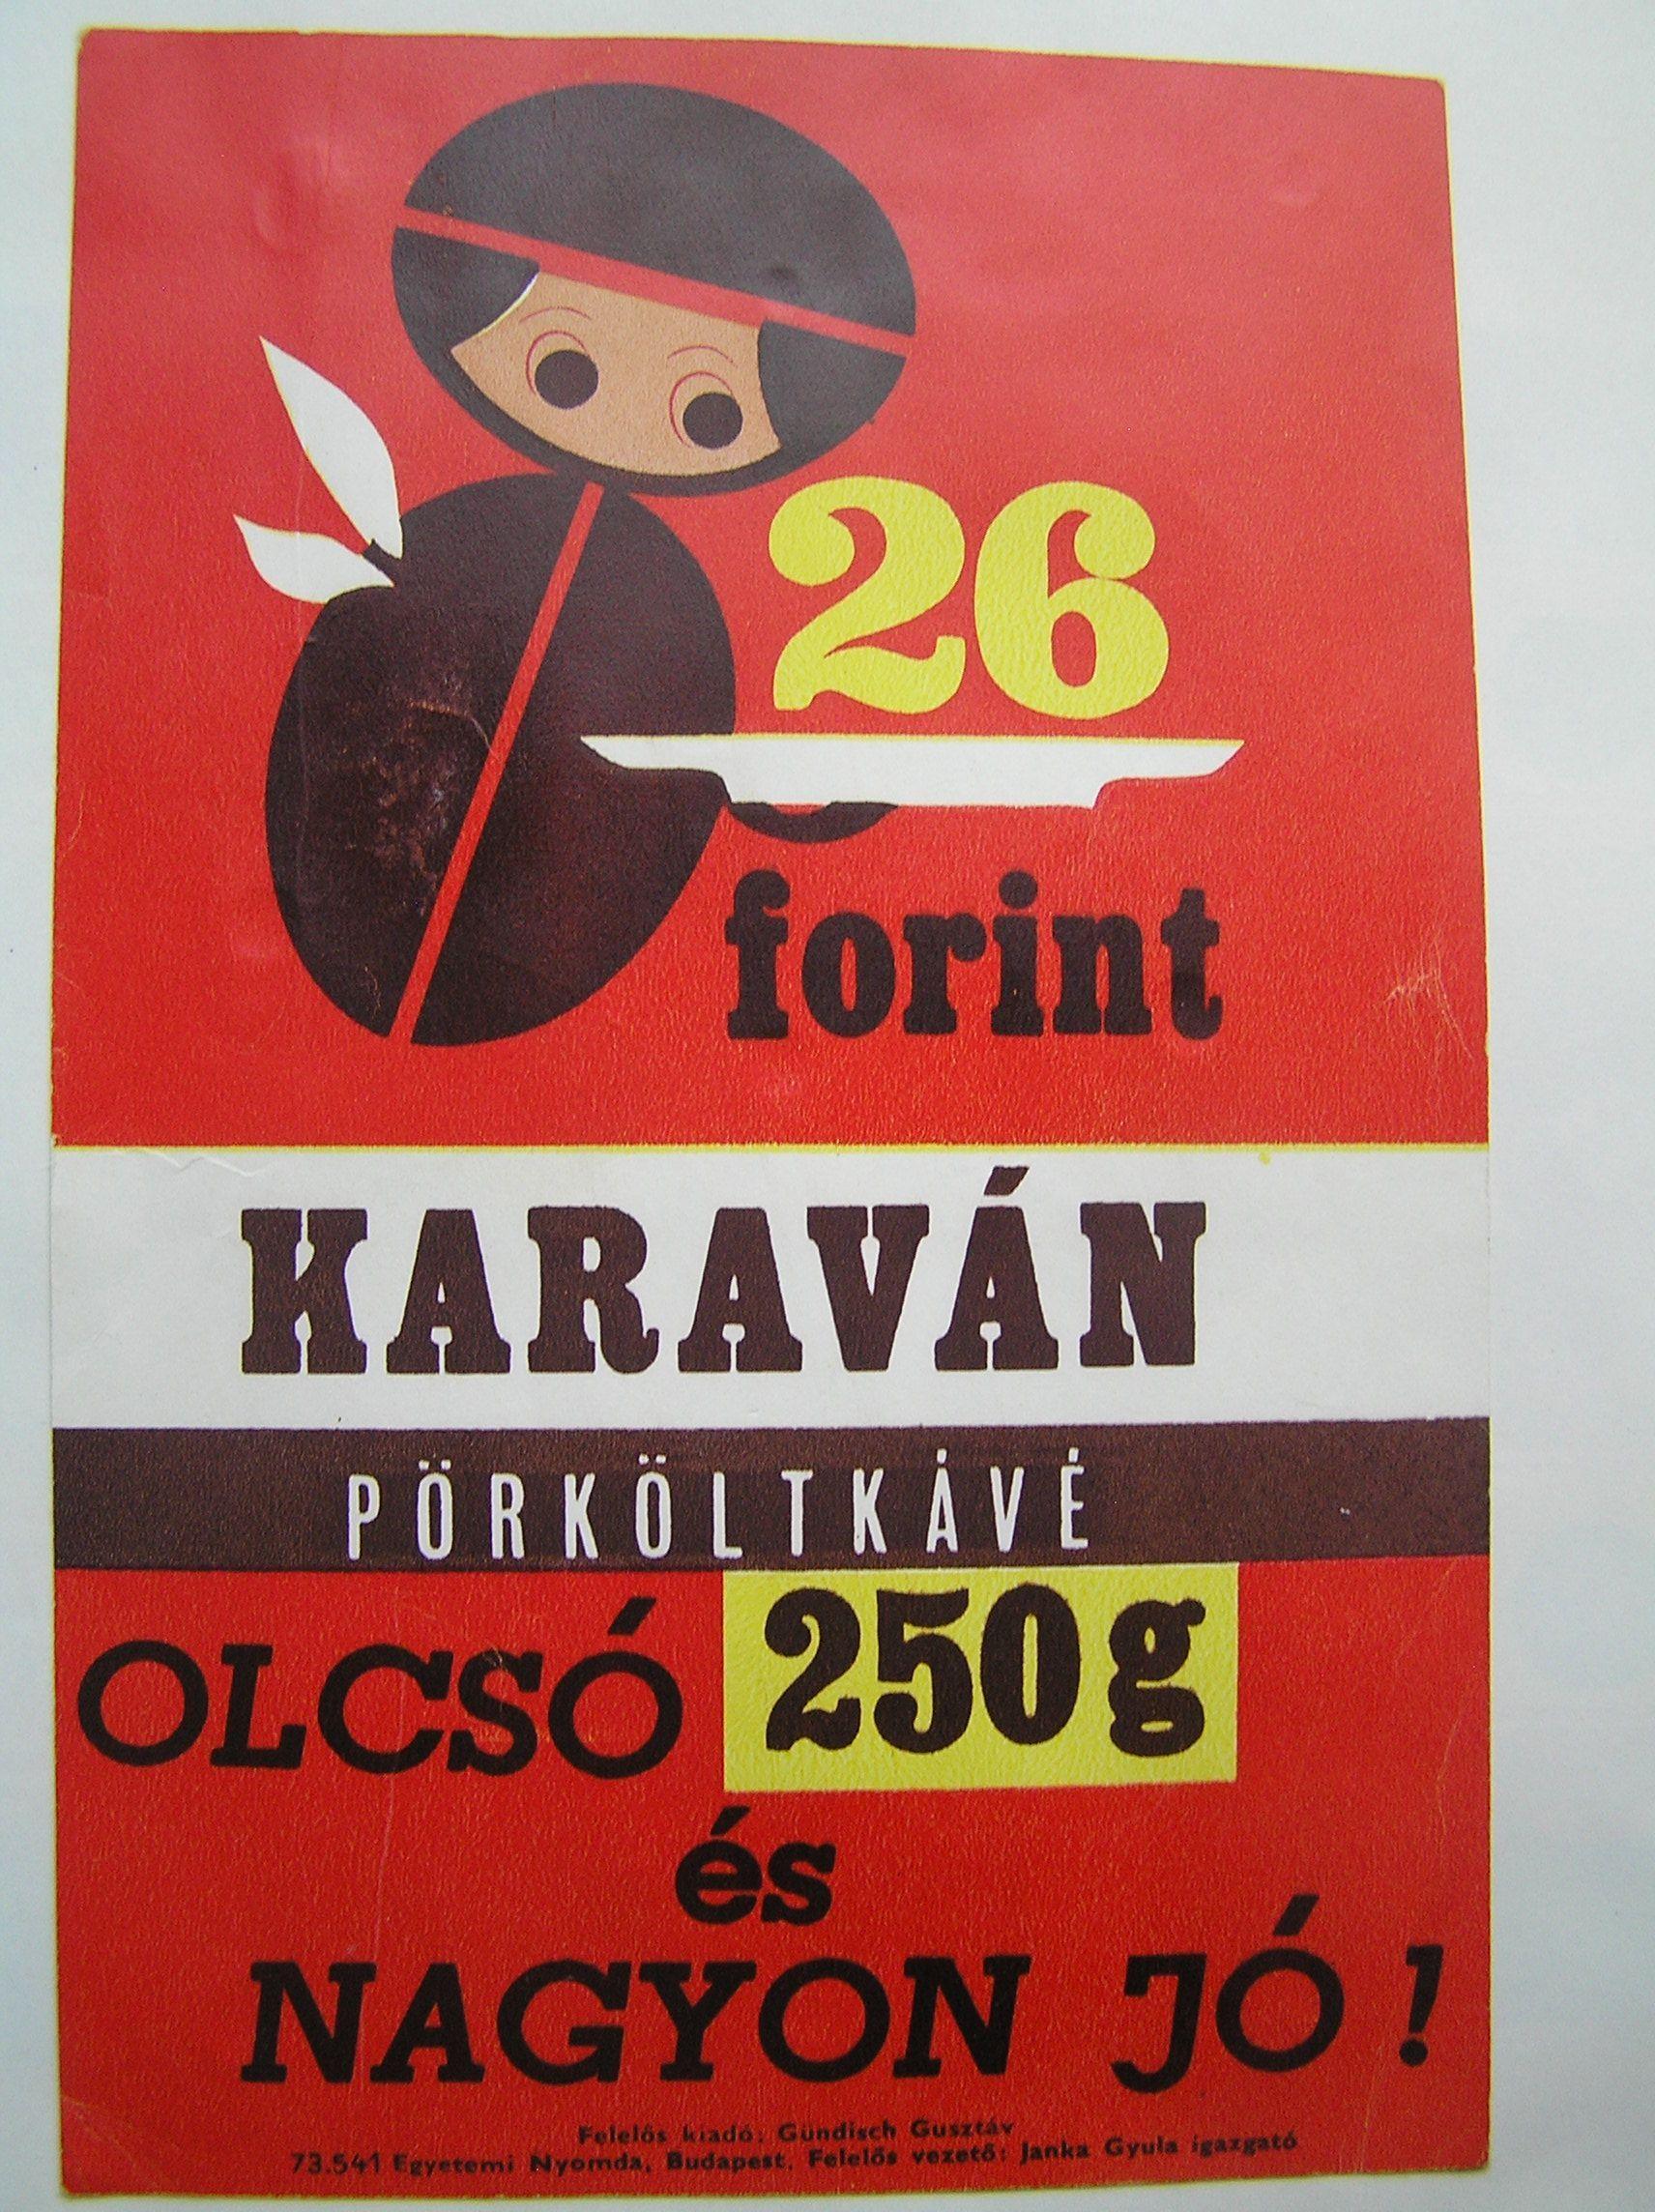 Karavan Kave In 2020 Retro Retro Logo Vintage Ads